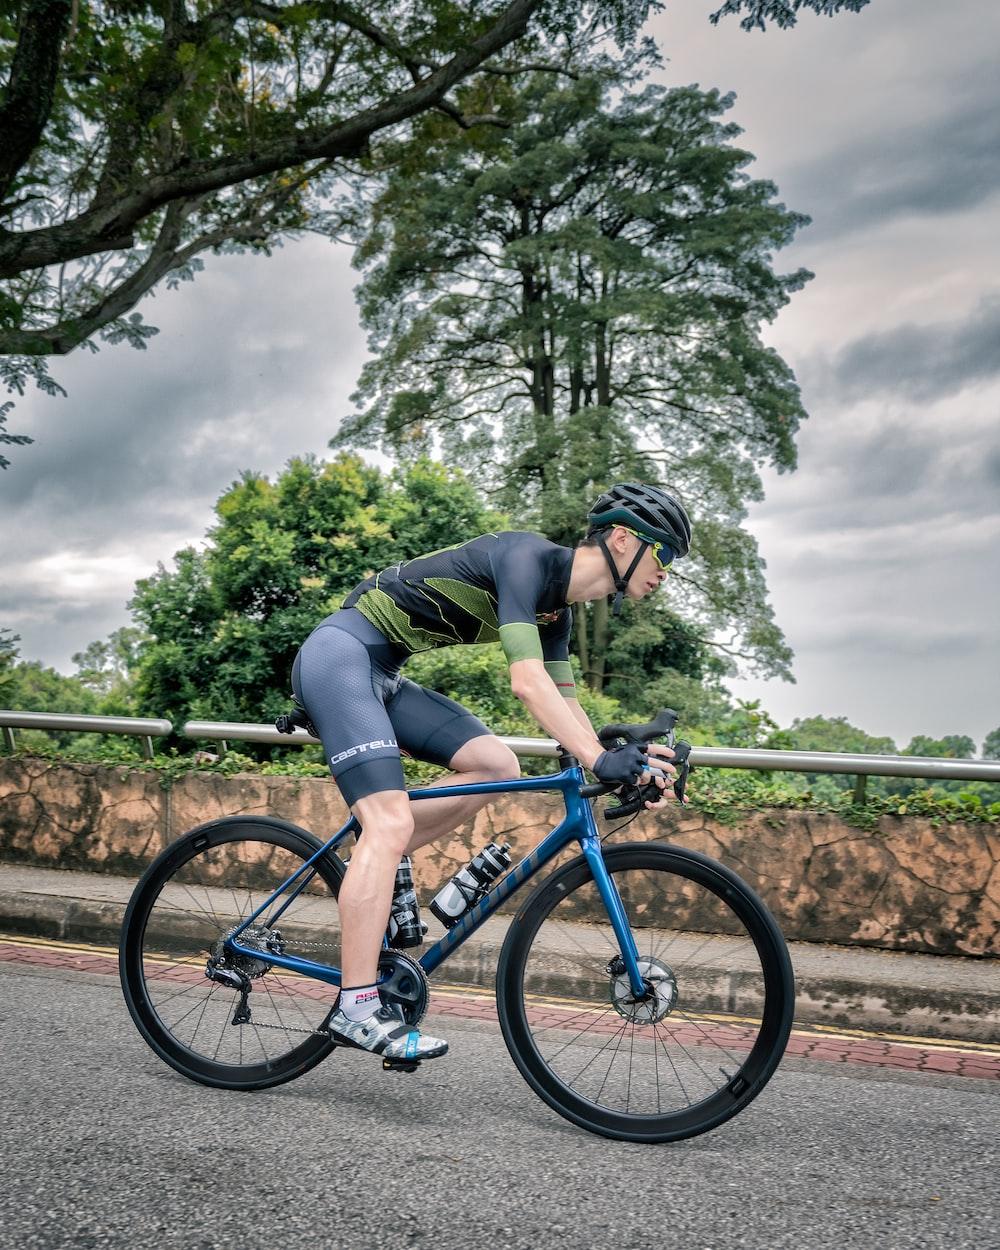 man in black shirt and black shorts riding blue mountain bike